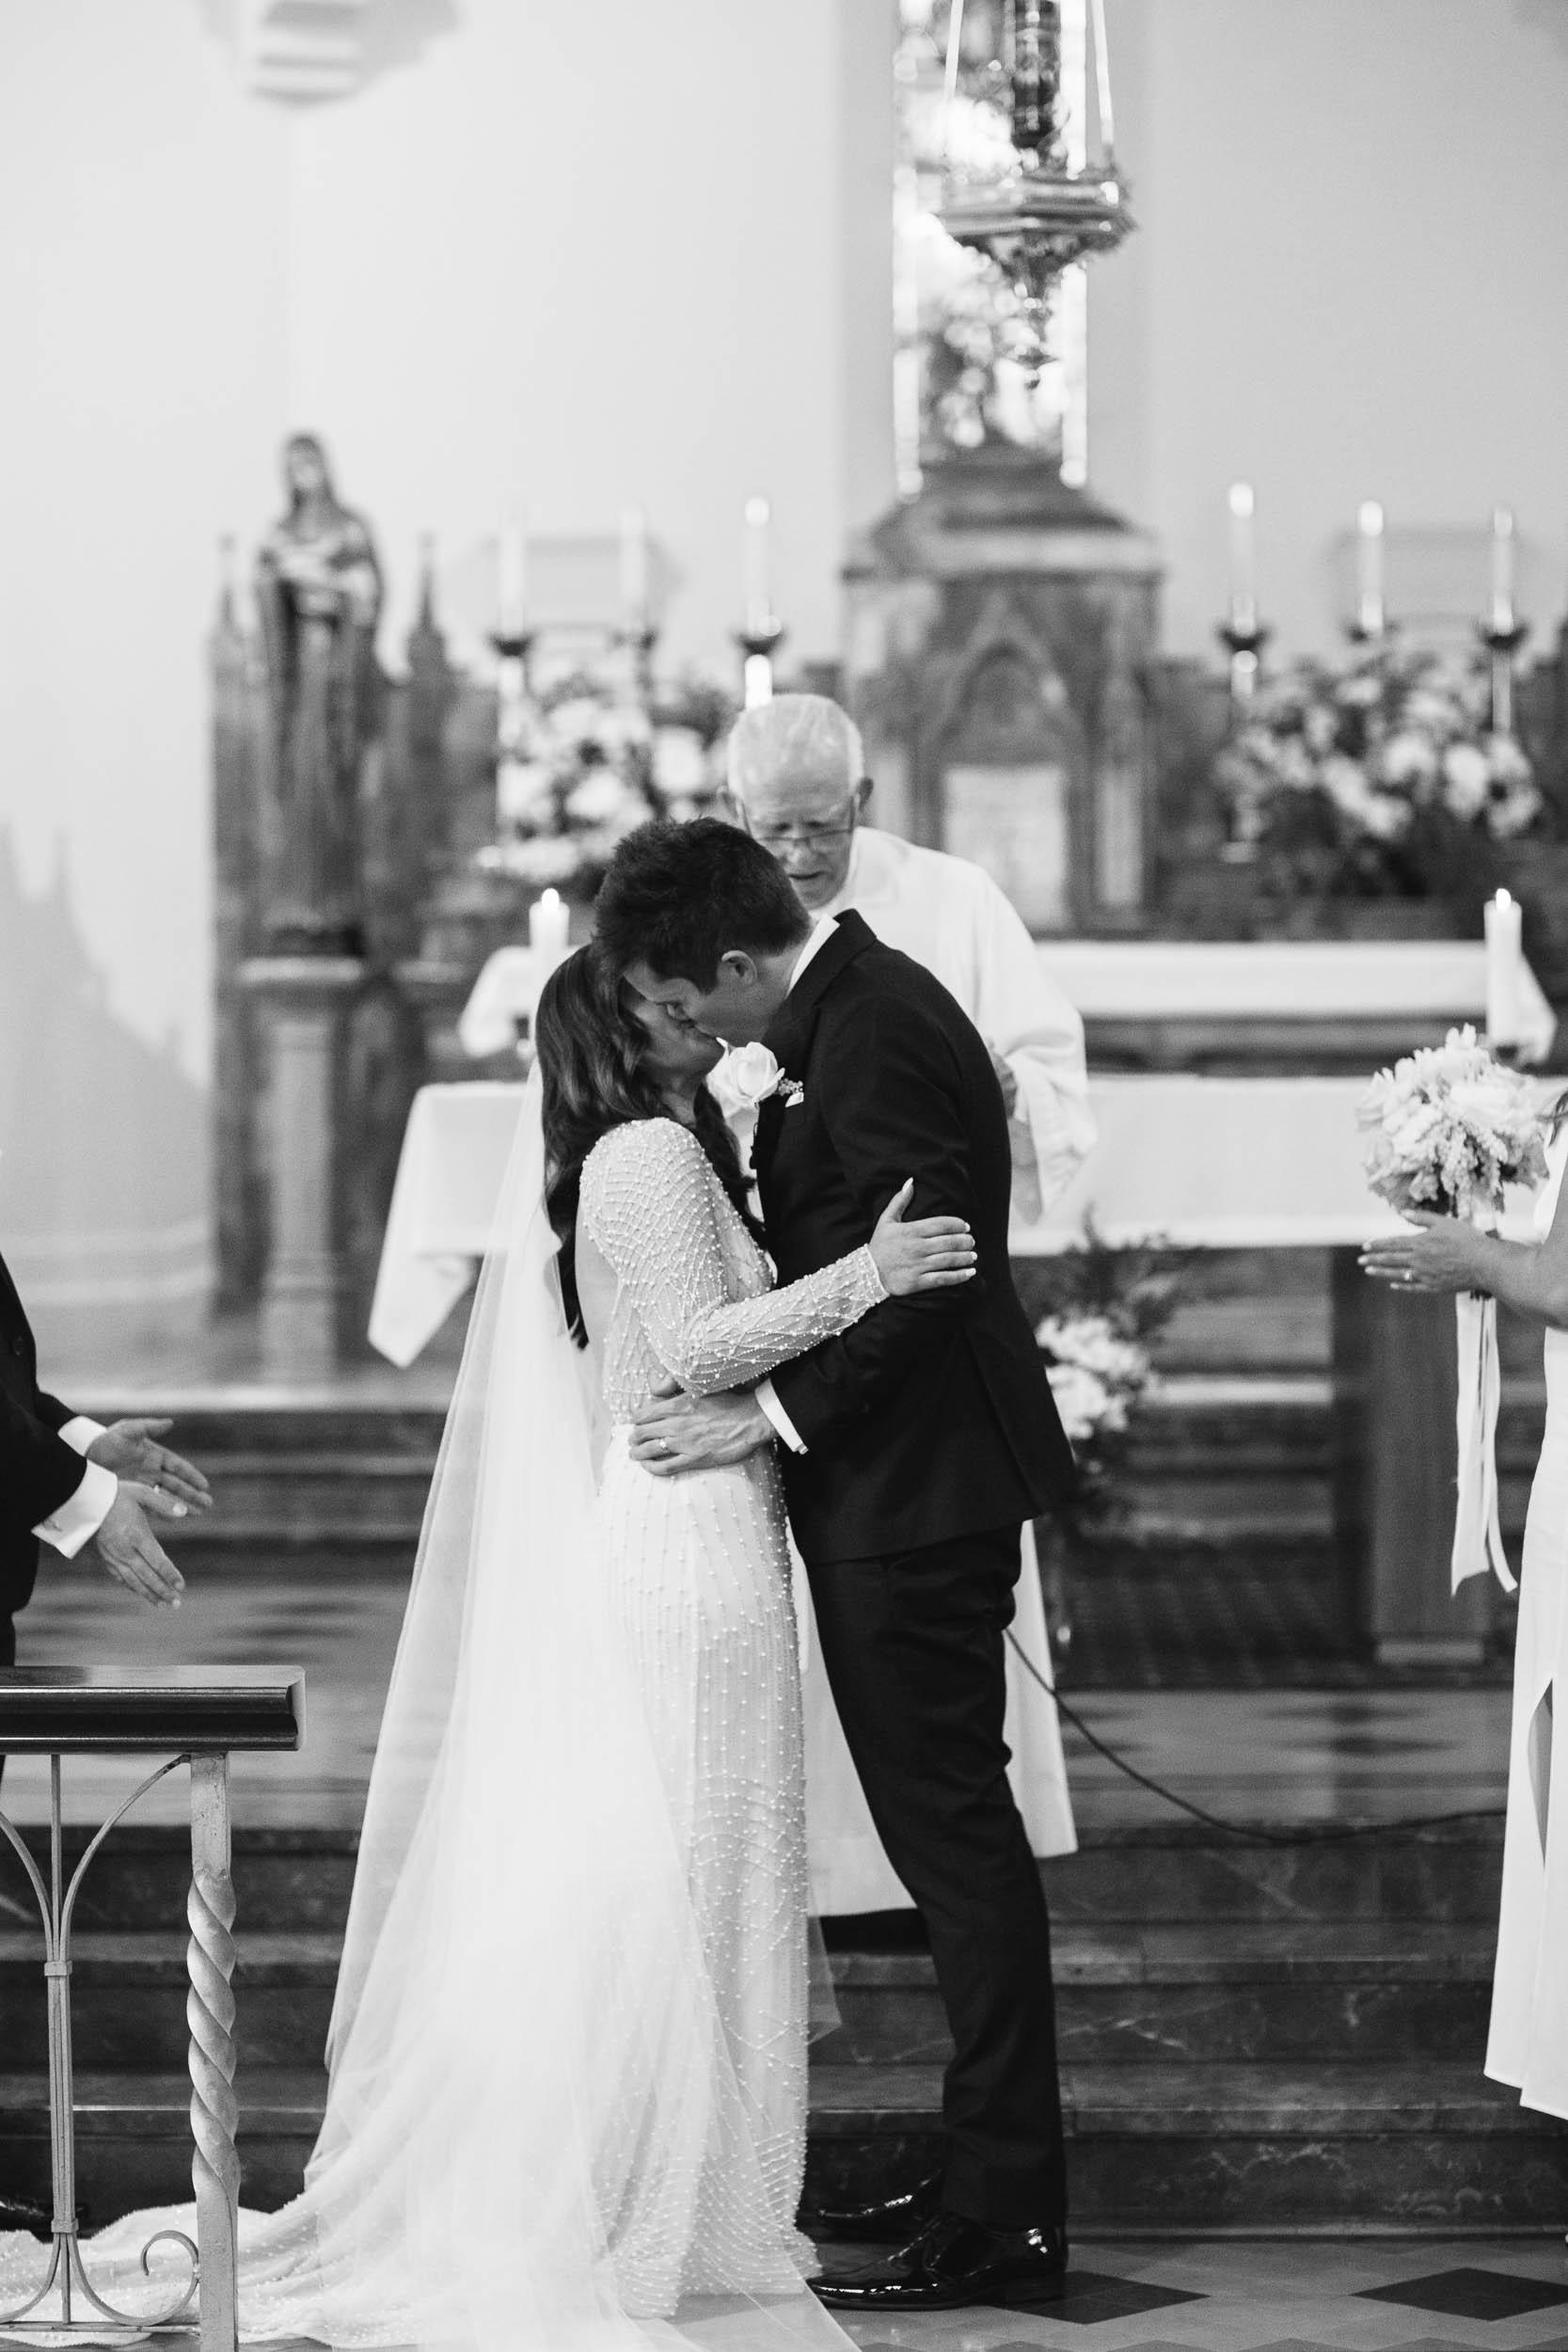 Kas-Richards-Wedding-Photographer-Melbourne-City-Wedding-Alto-Event-Space-Jane-Hill-Bridal-Gown-32.jpg